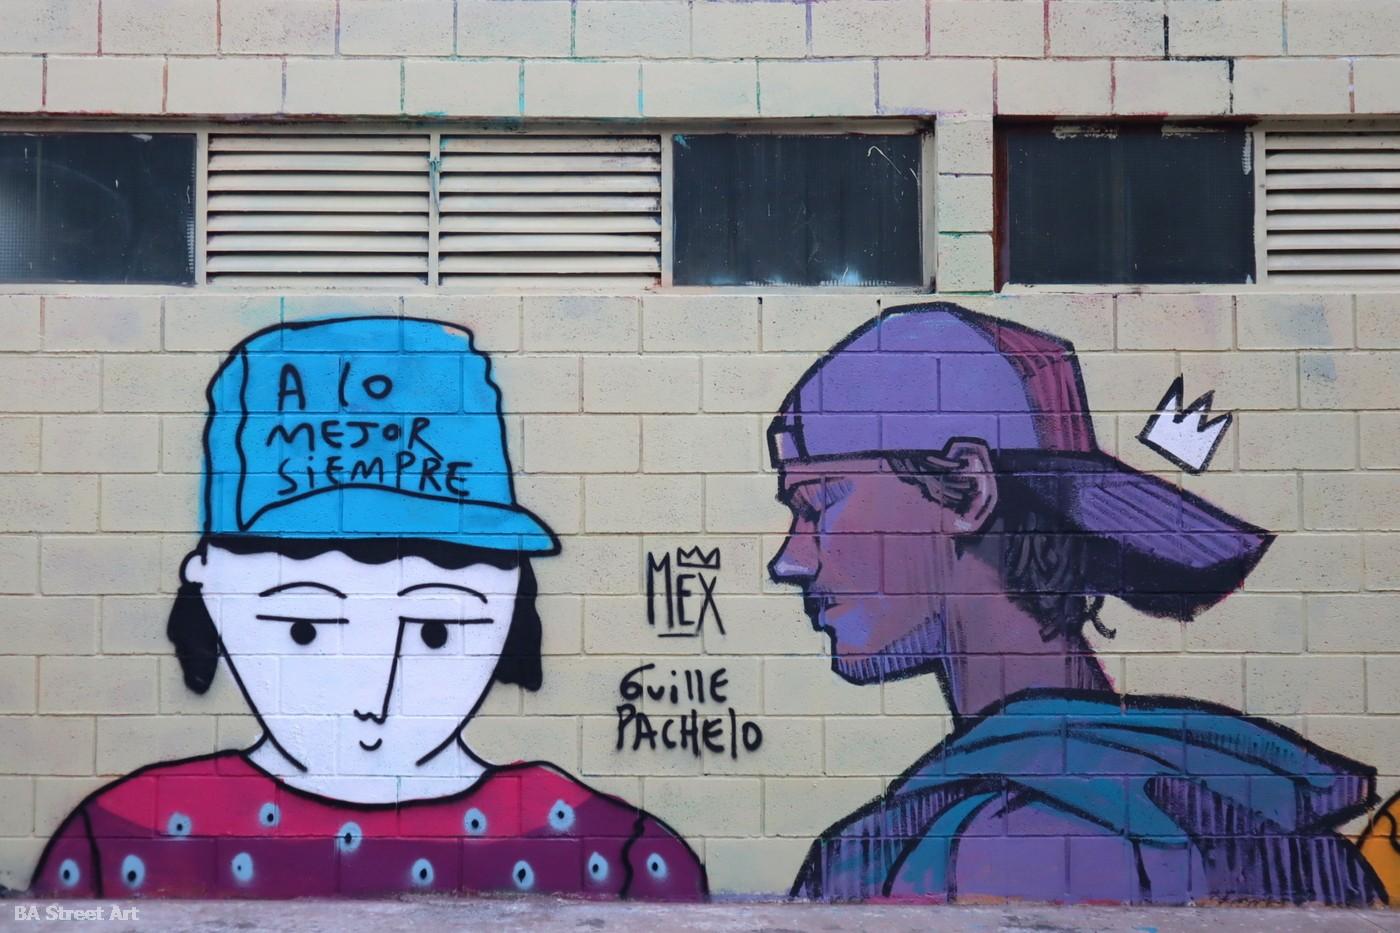 mex street artist murales artista cordoba murales corona basquiat grafiti buenosairesstreetart.com.jpg